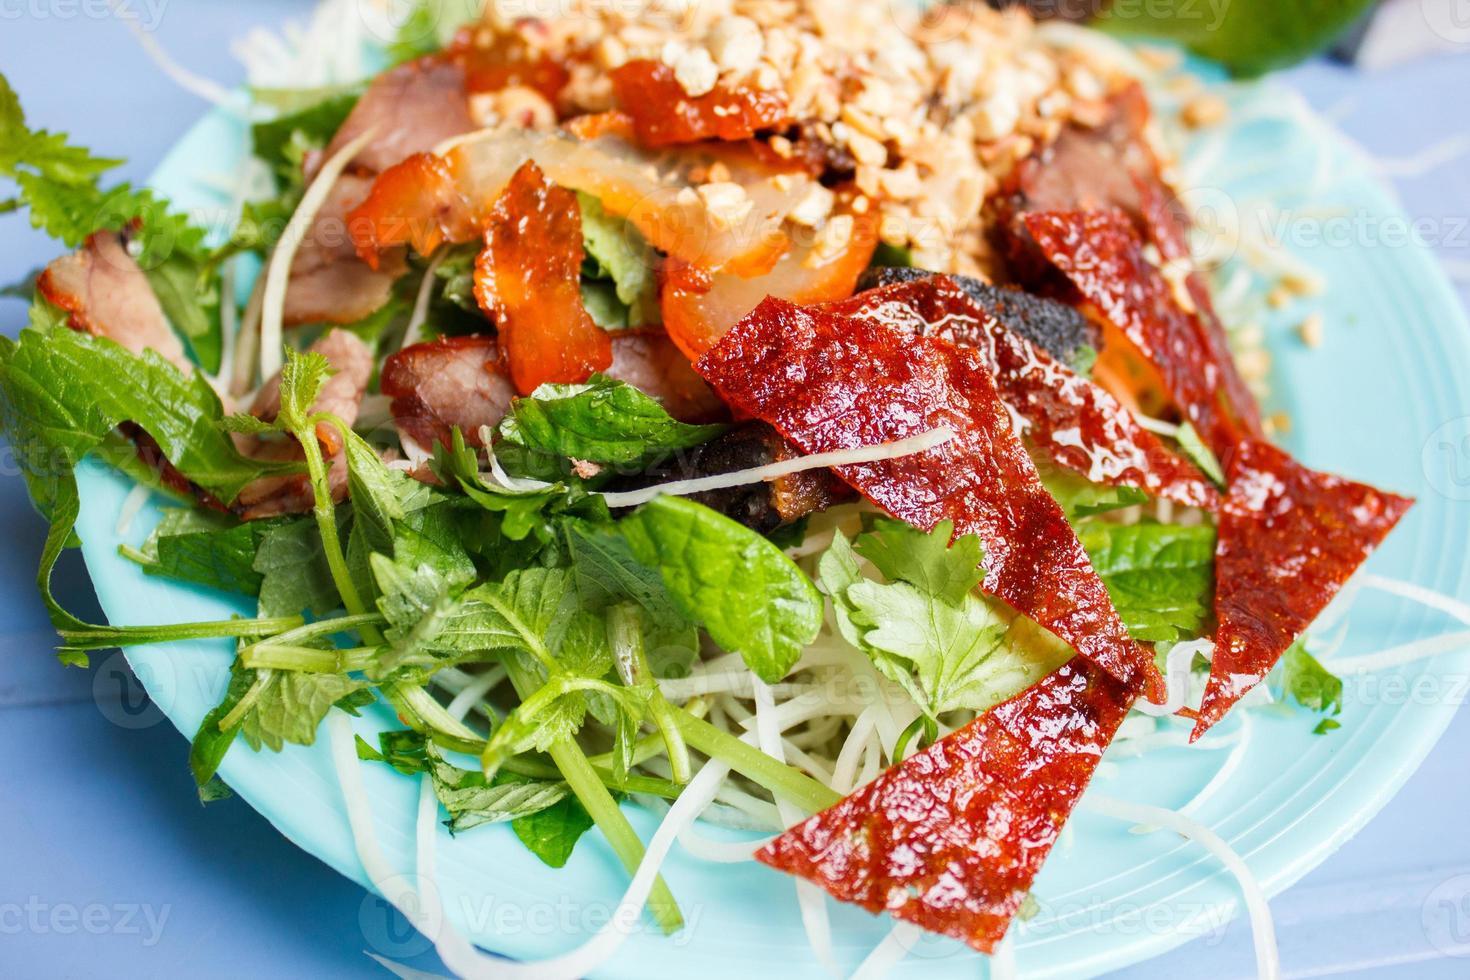 Vietnamese street food, fresh vegetable with crispy duck skin photo